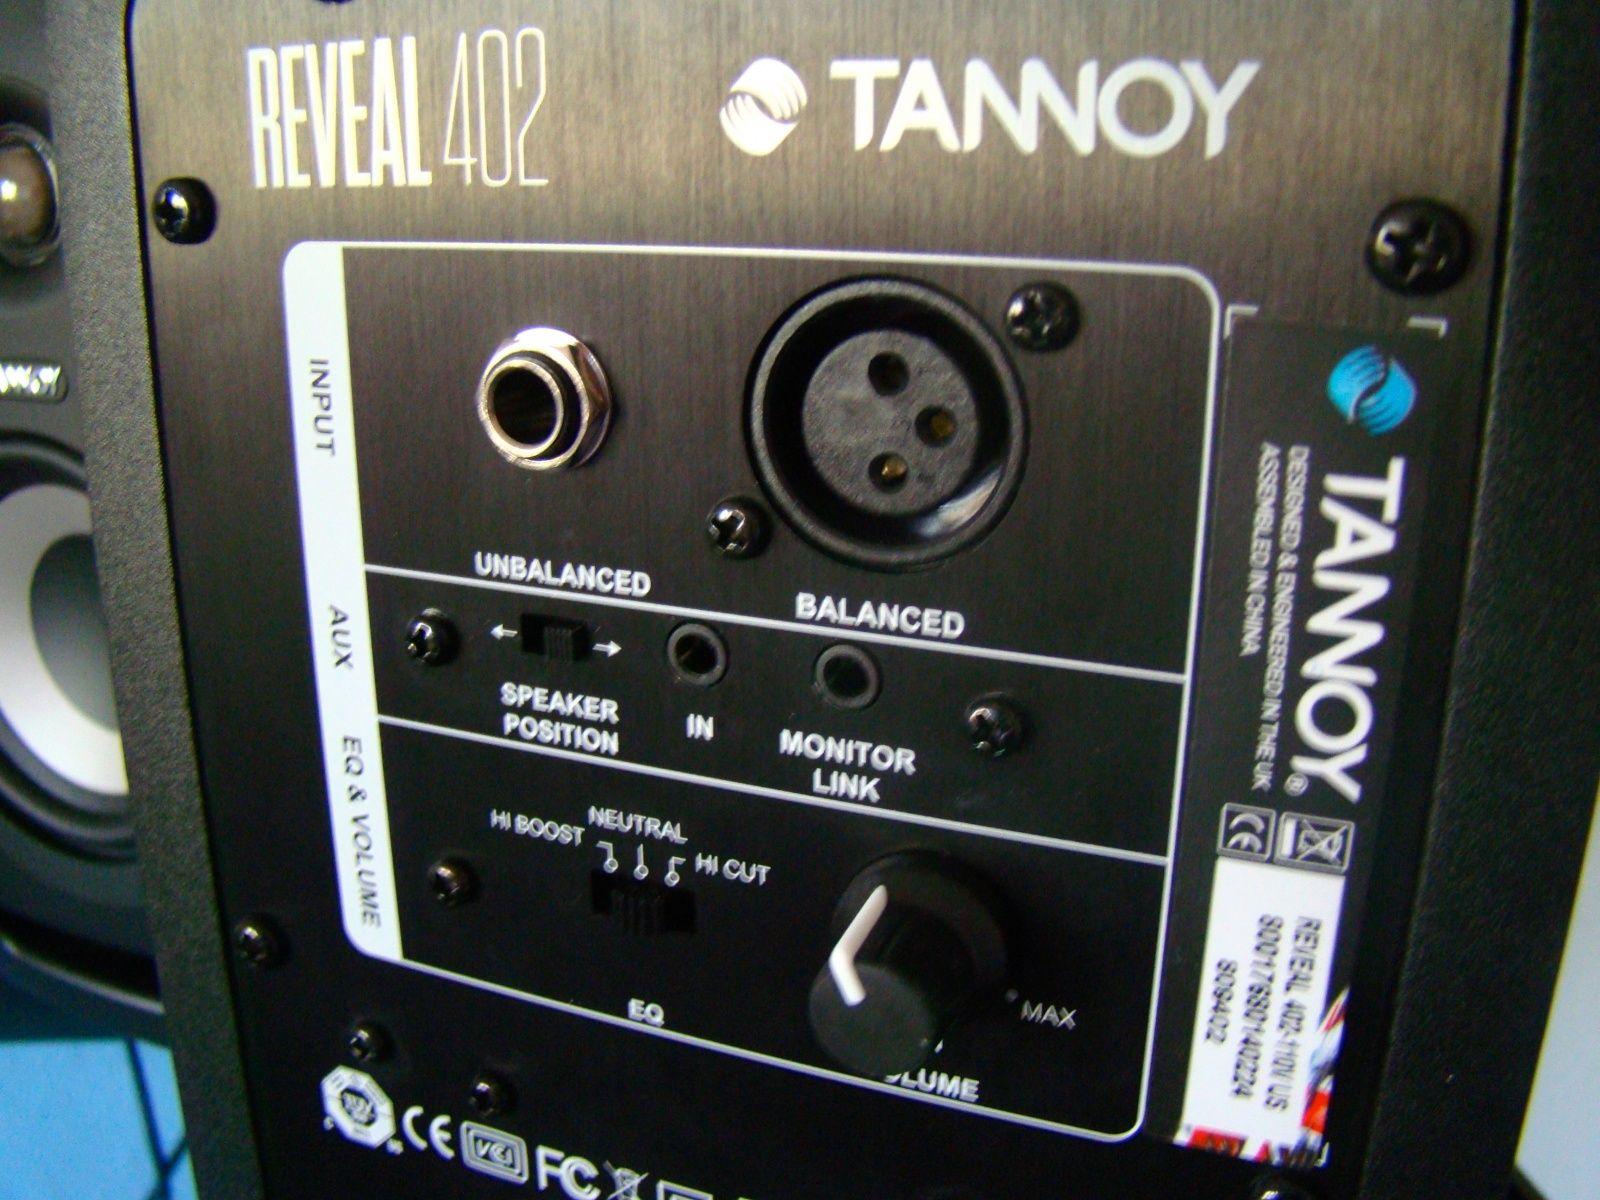 Loa kiểm âm monitor Tannoy Reveal 402